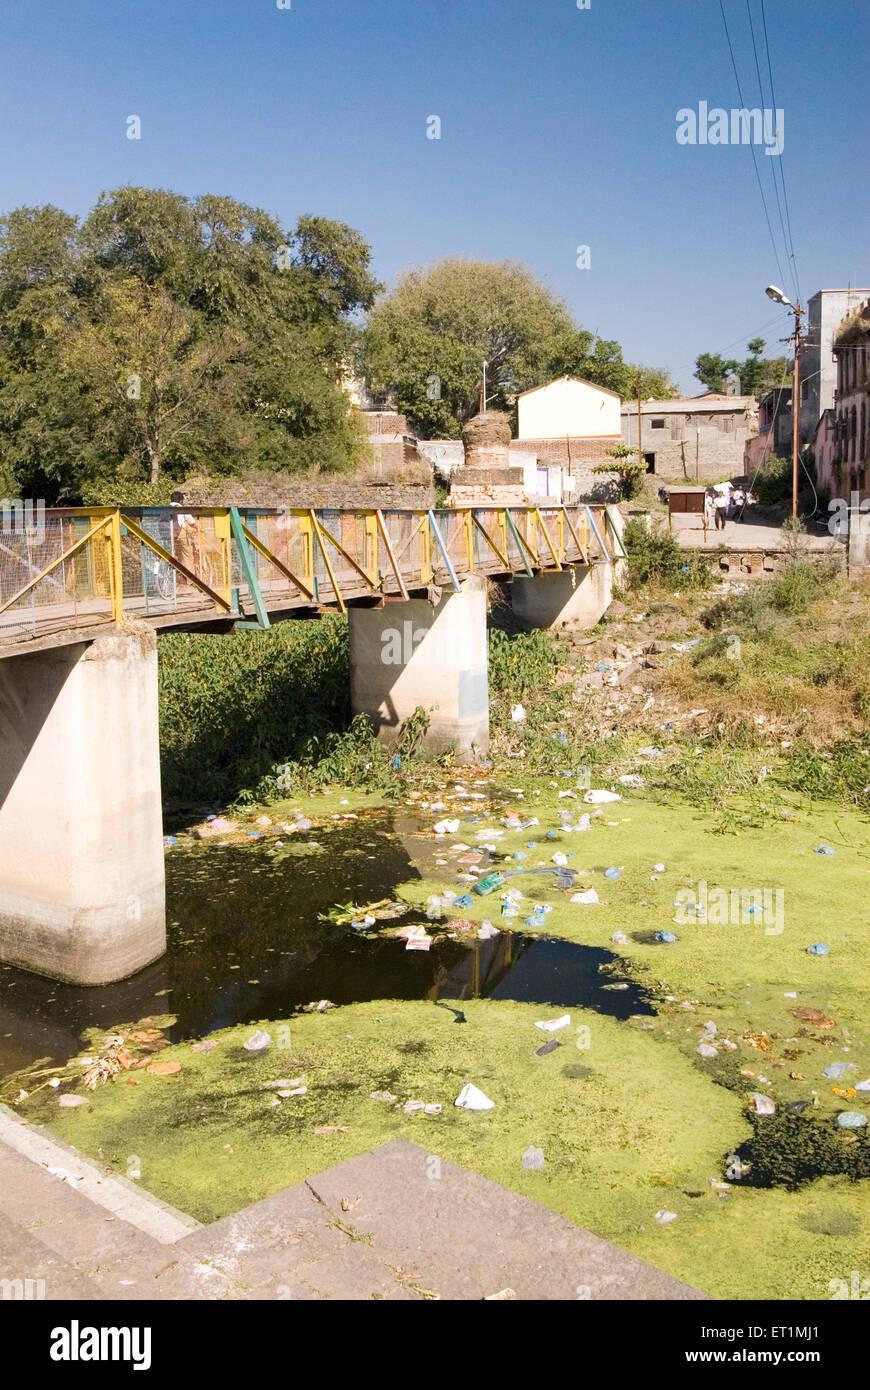 Umweltverschmutzung; Fluss, Müllhalde verwandelt; Menschen werfen Müll im Fluss Karh im Sasvad Dorf; Taluka Stockbild